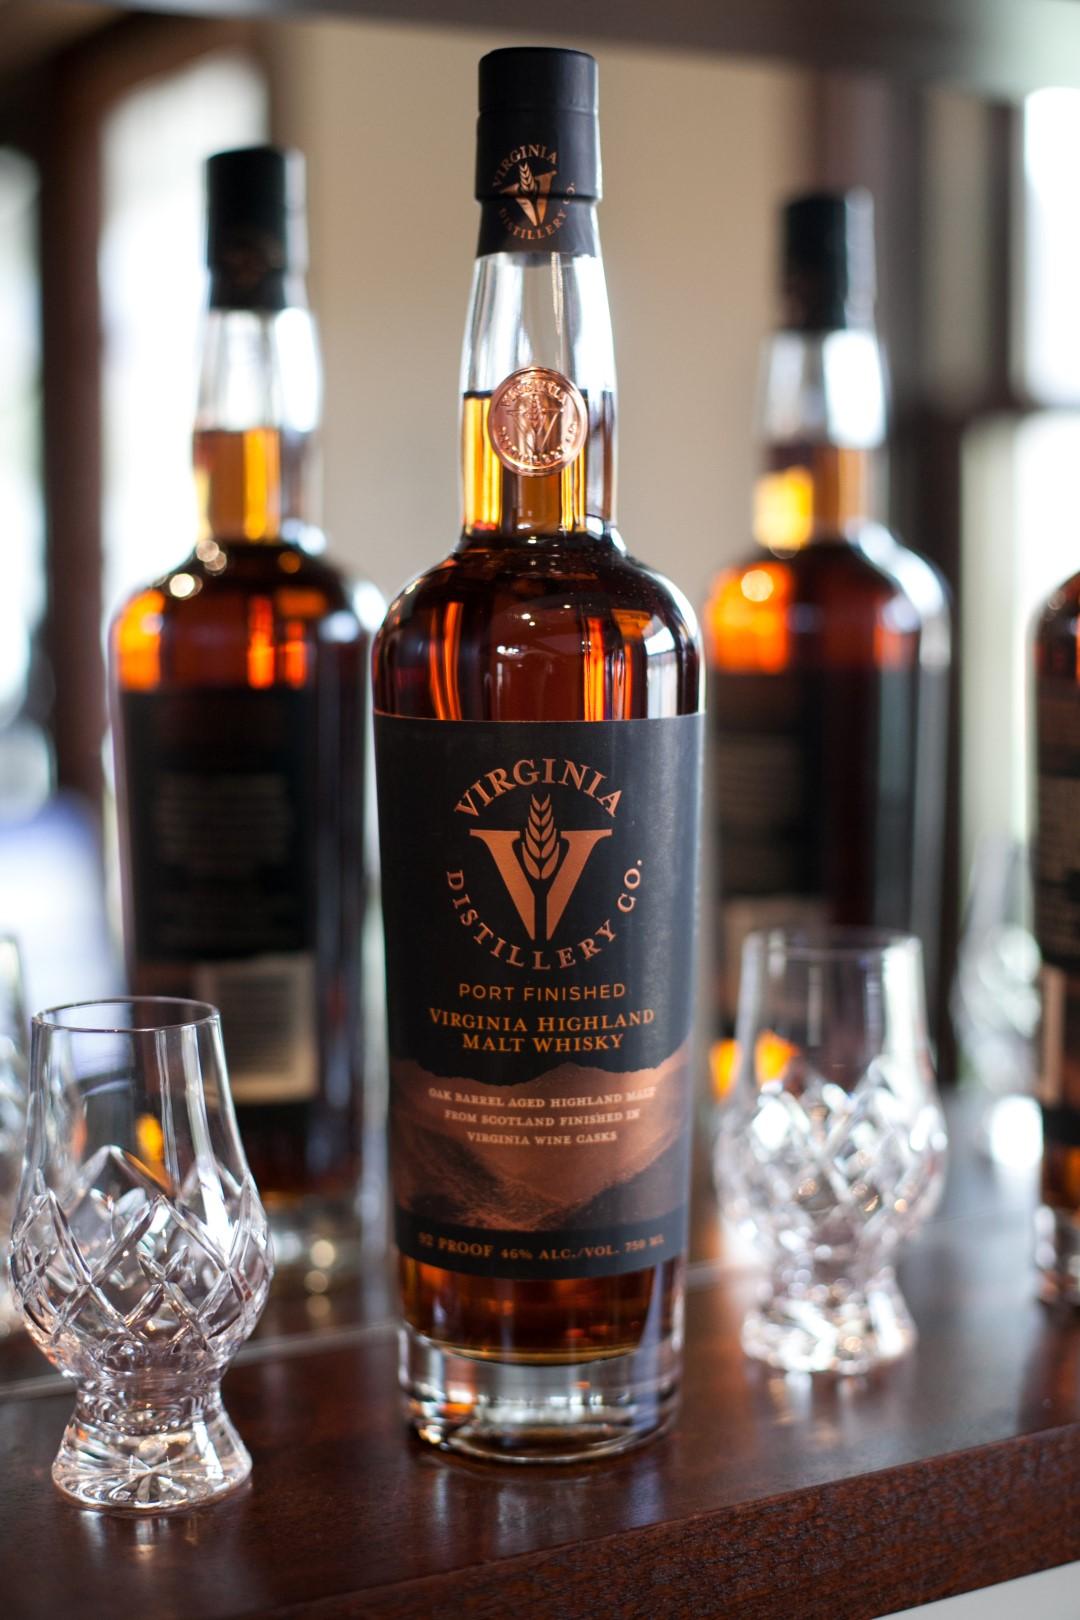 Virginia Distillery Port Finished Virginia Highland Malt Whisky